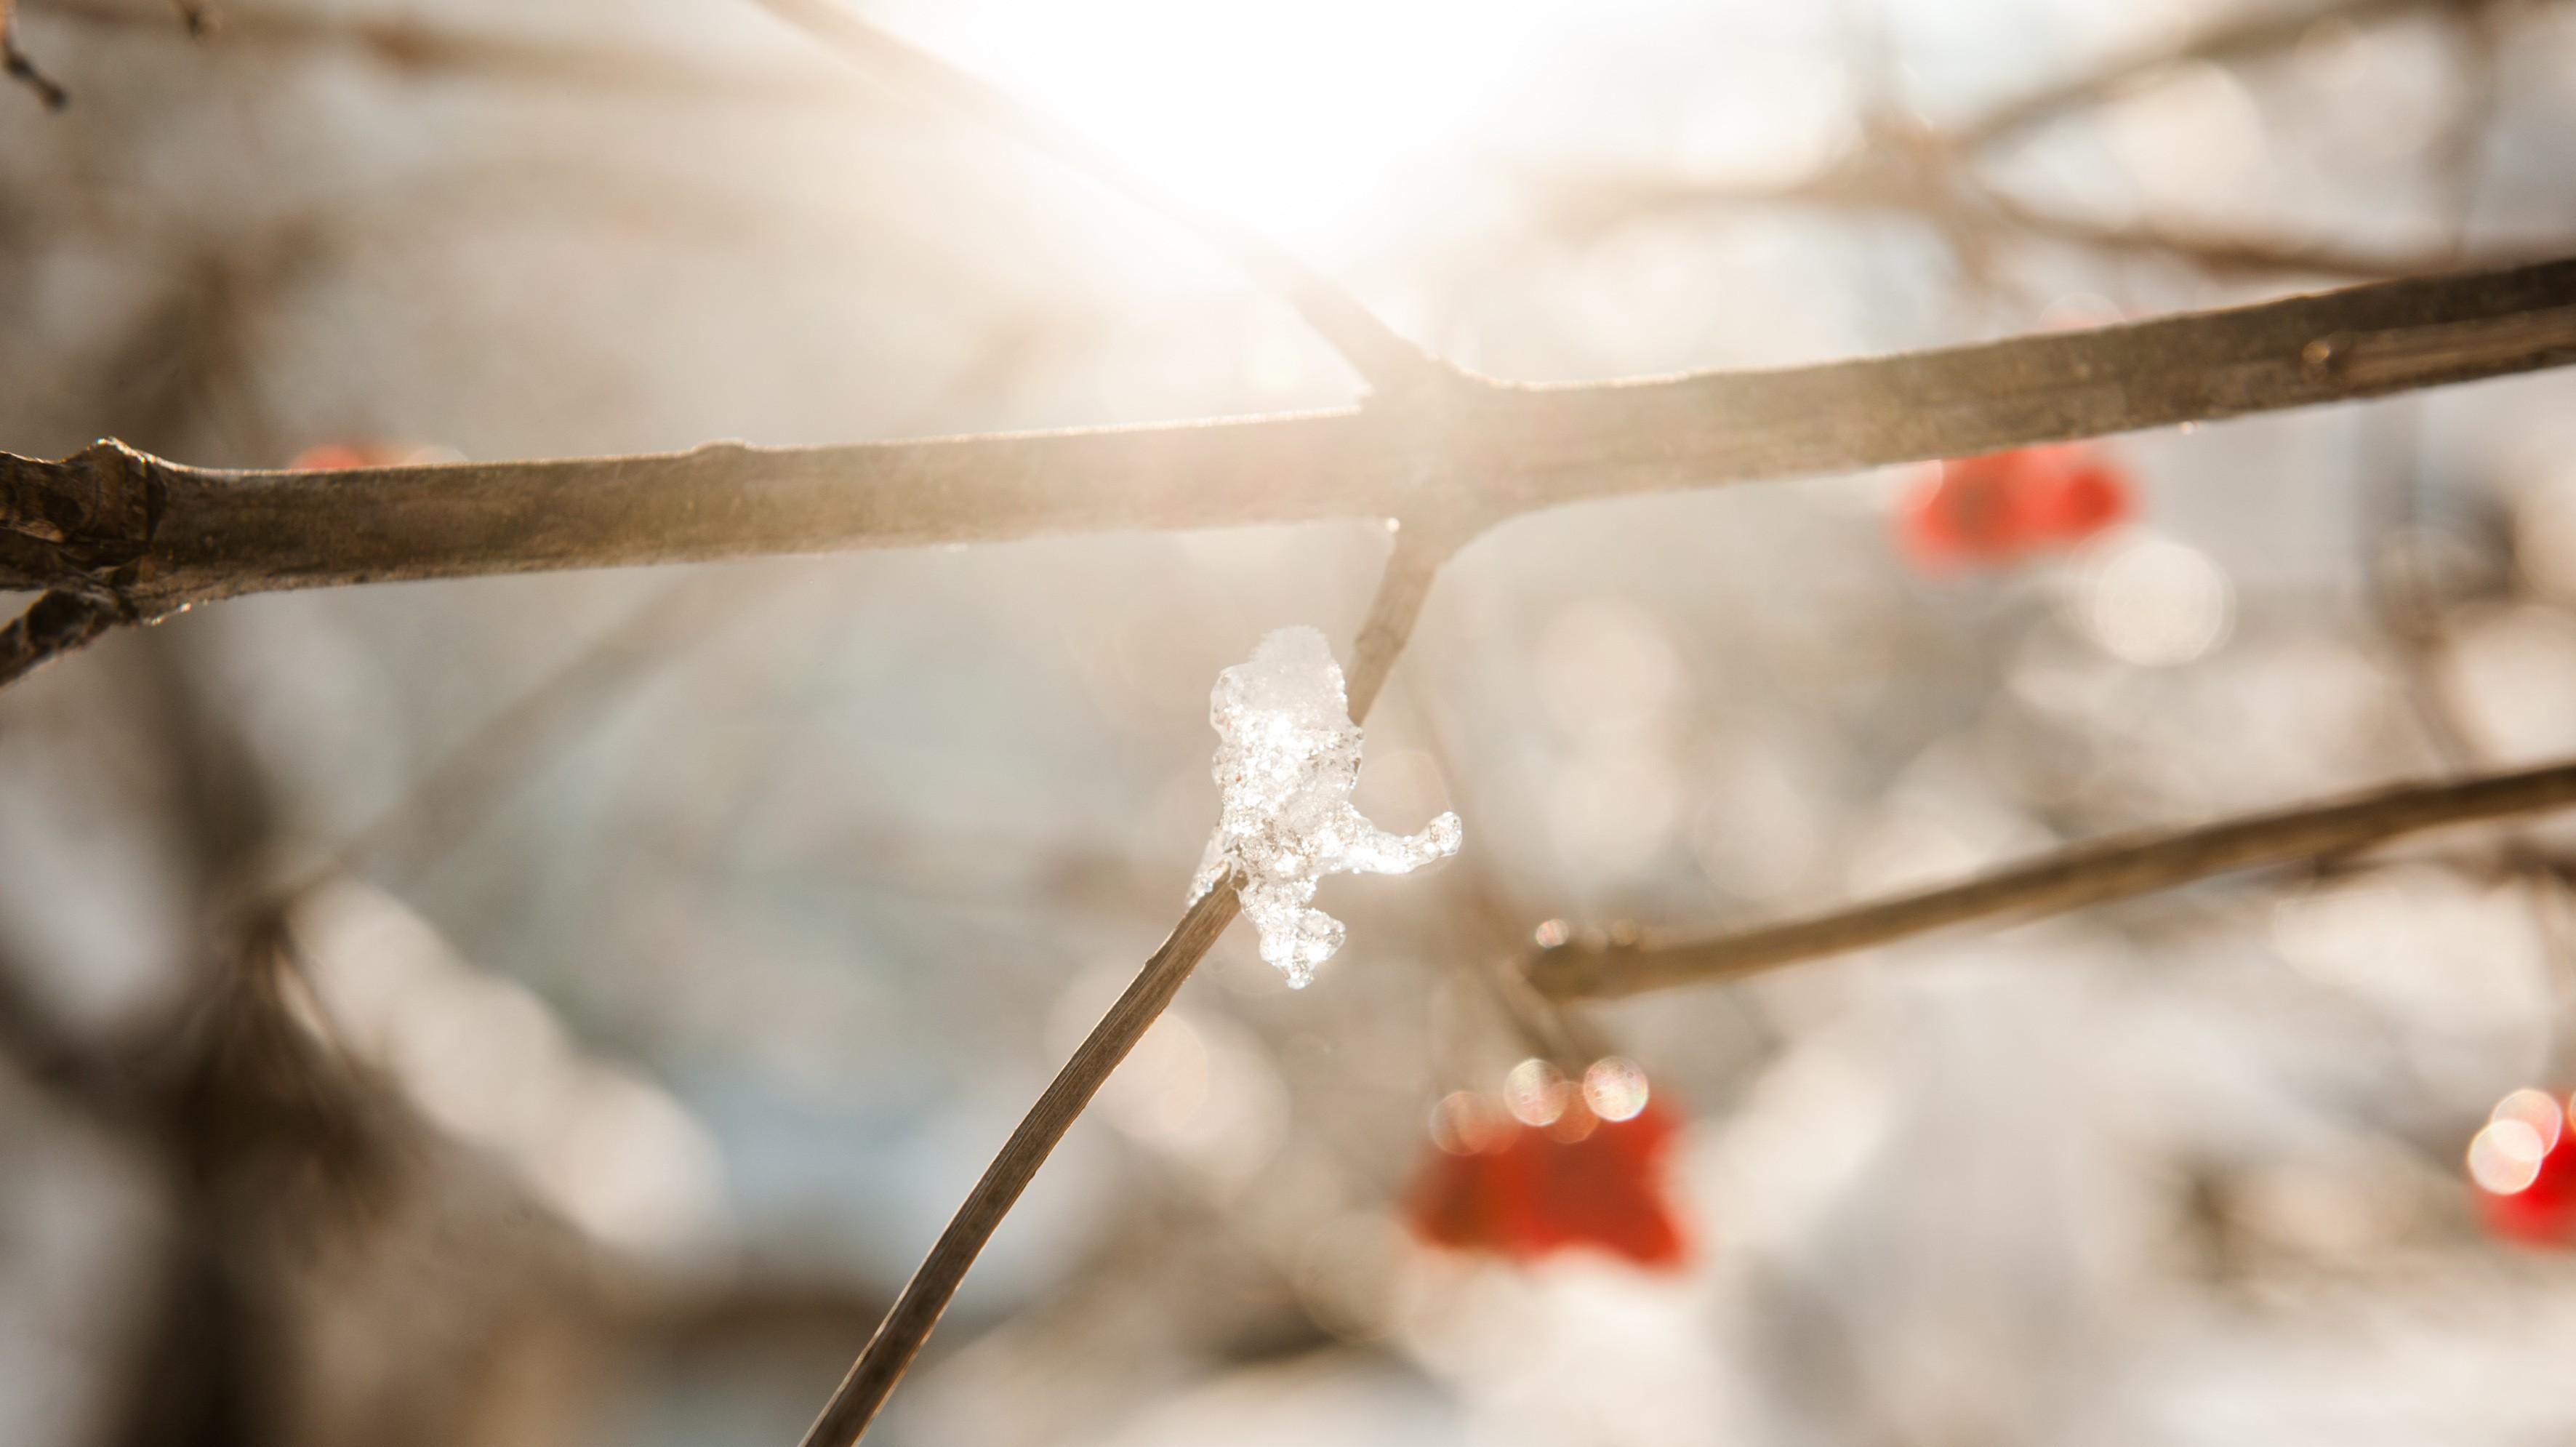 Beeren im Gegenlicht, Winter